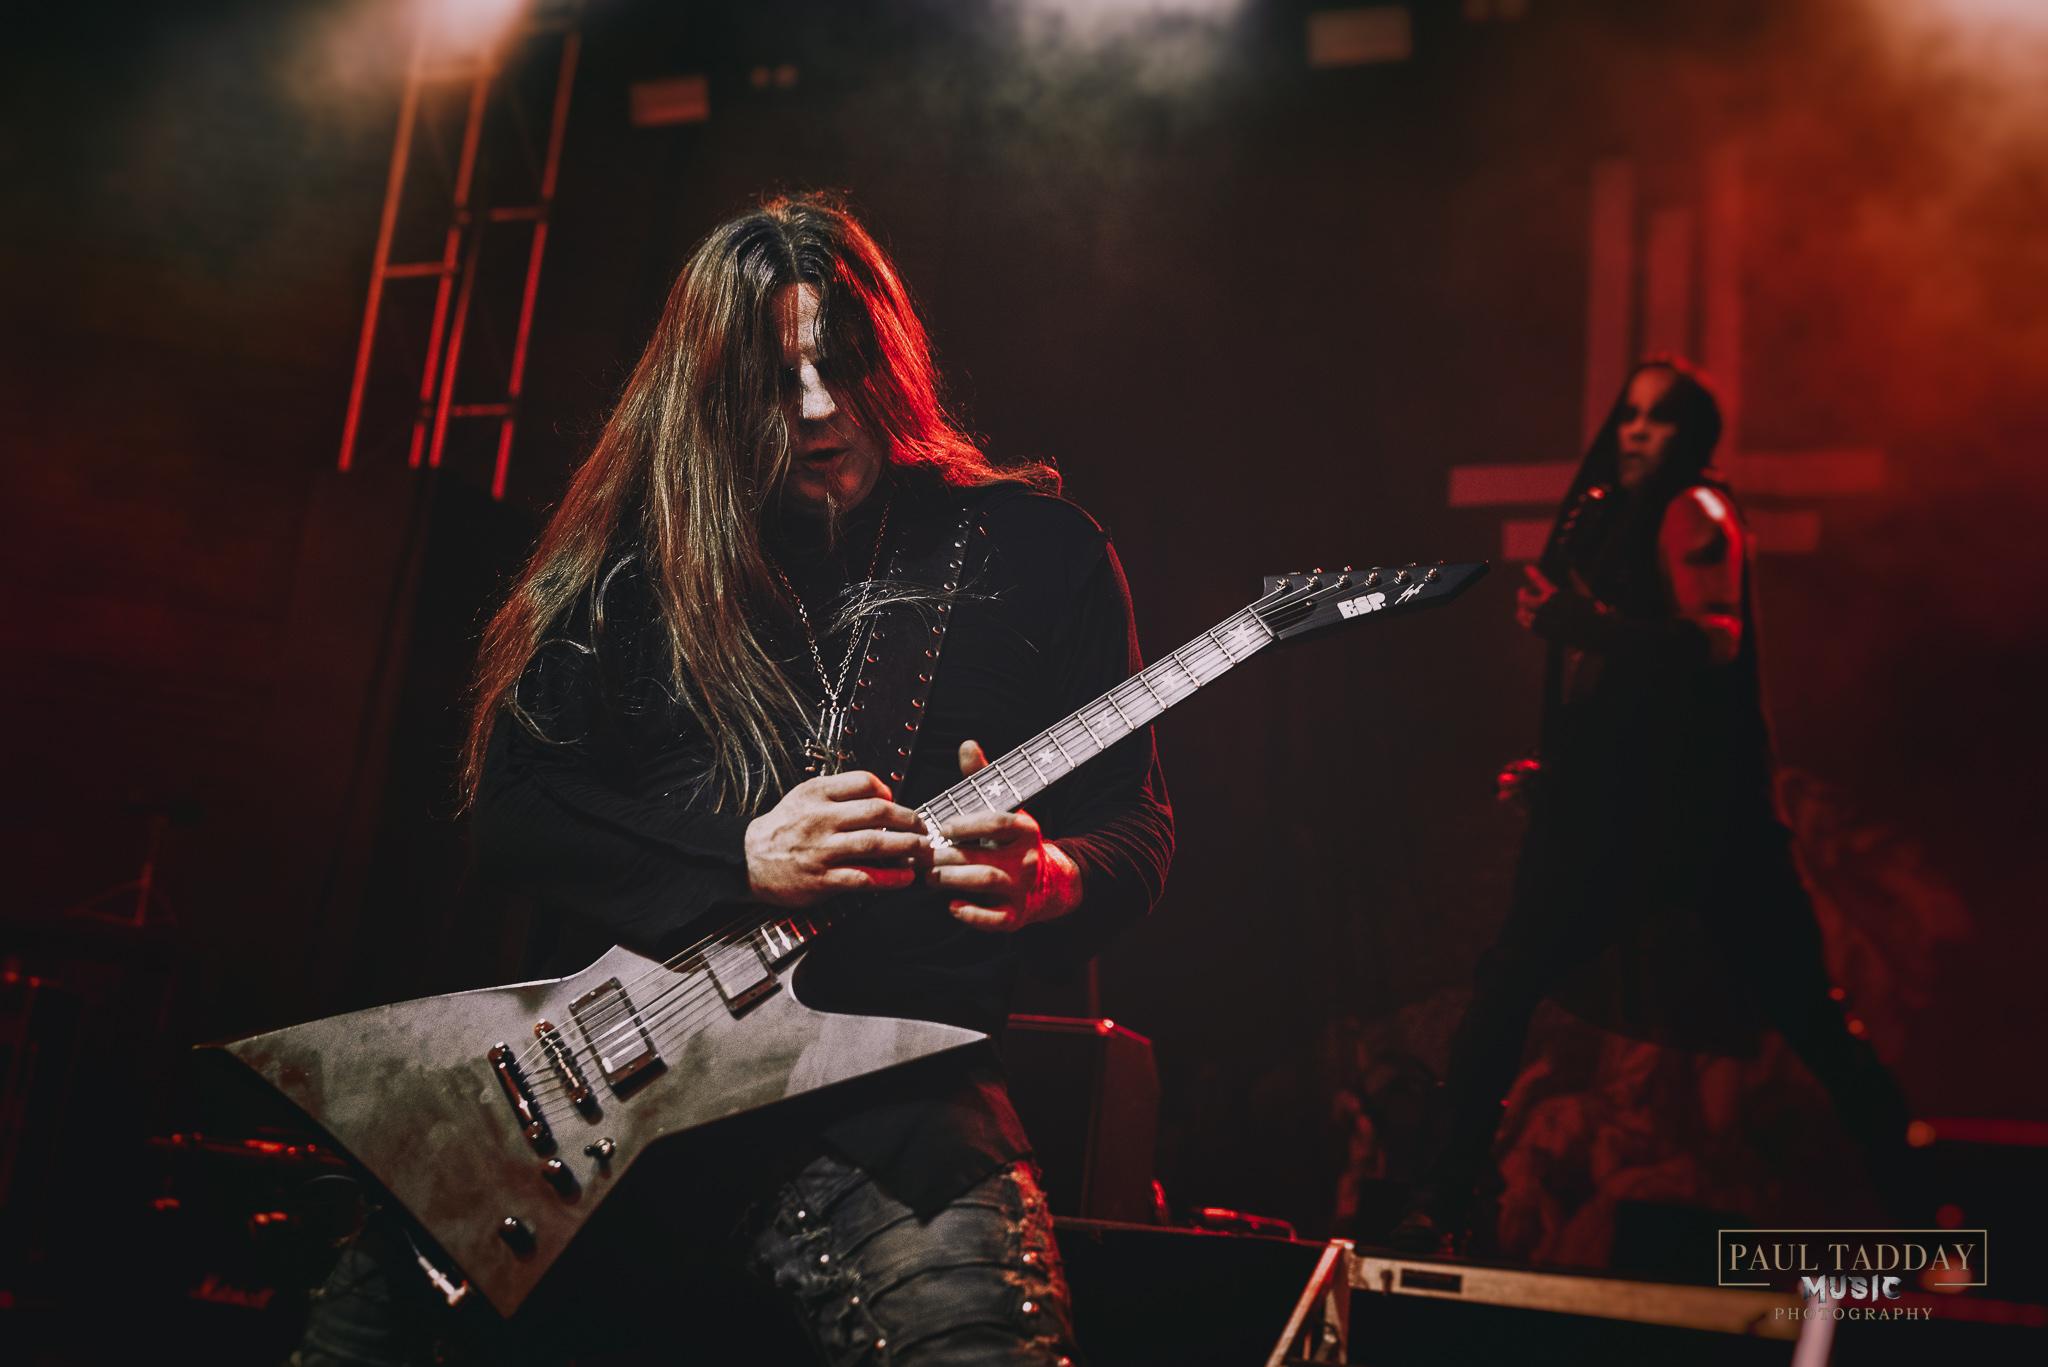 behemoth - brisbane - march 7 2019 - web - paul tadday photography - 31.jpg